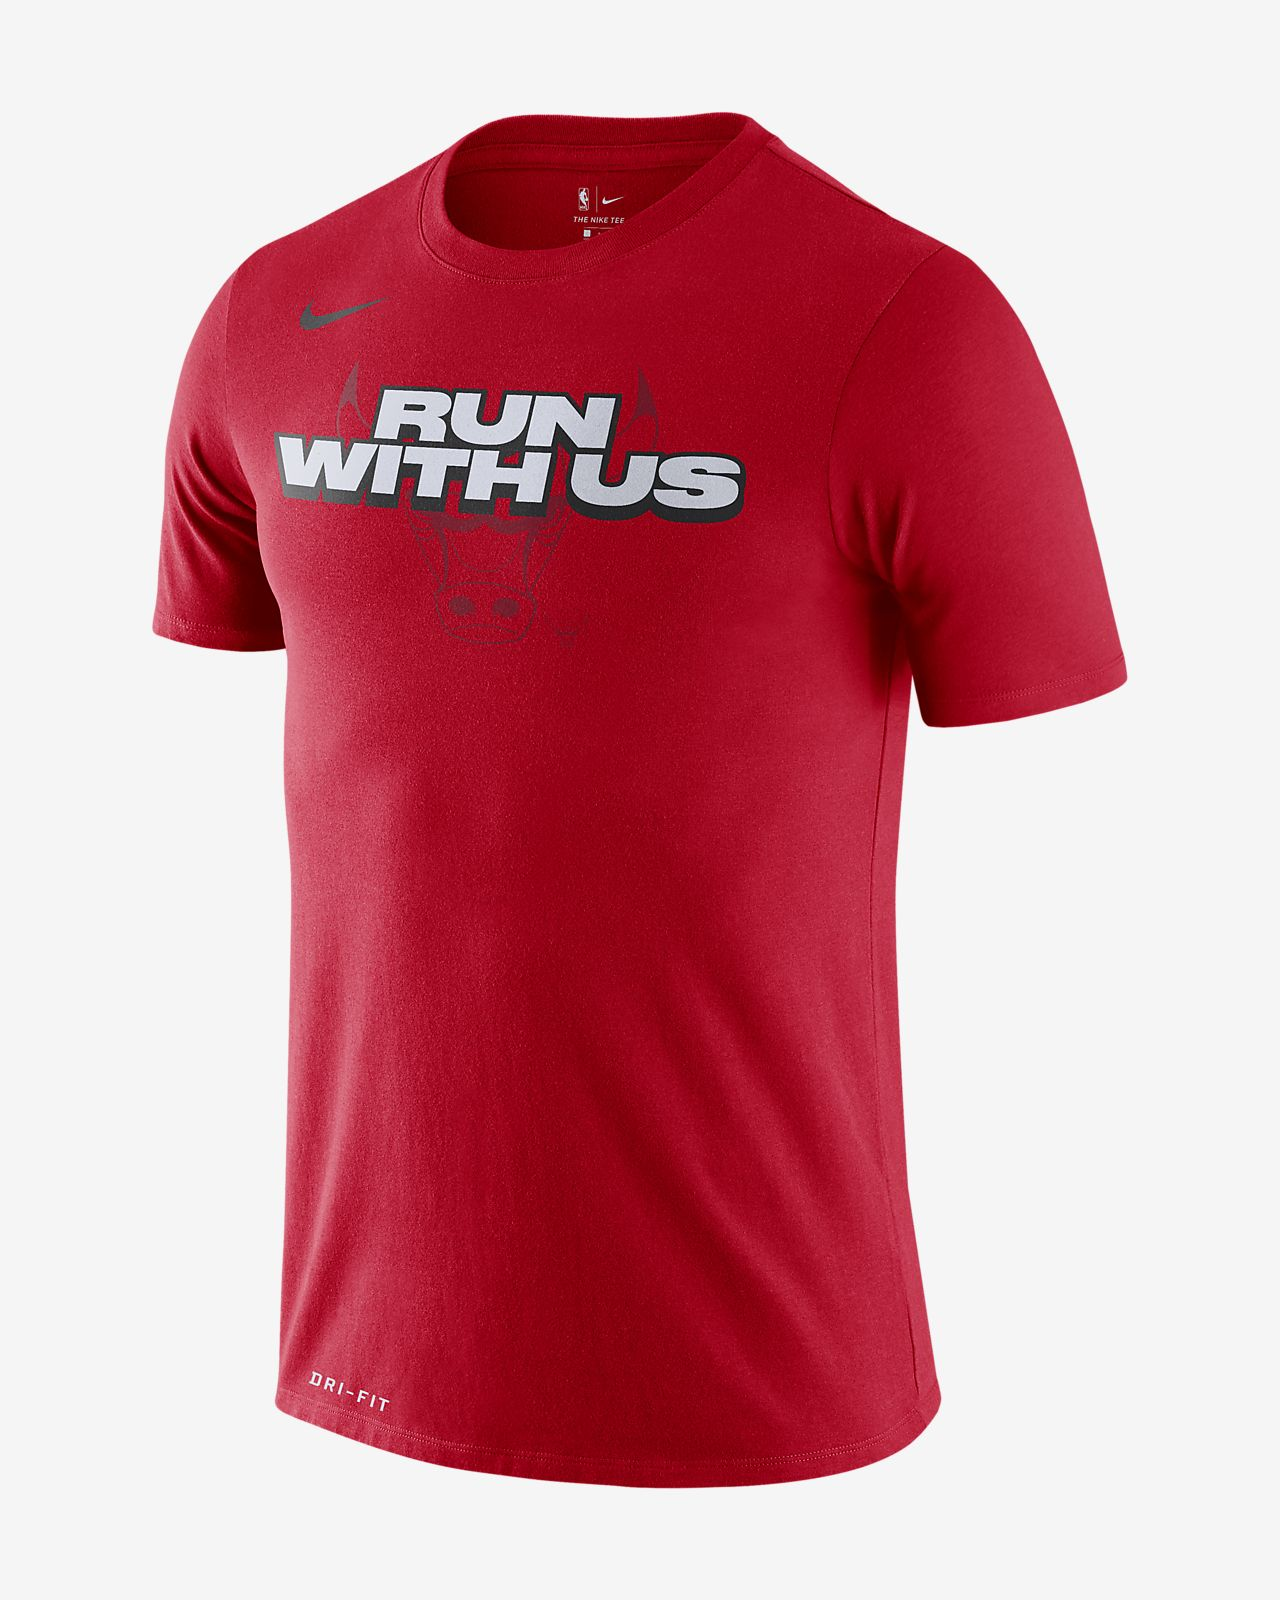 Chicago Bulls Nike Dri-FIT Men's NBA T-Shirt